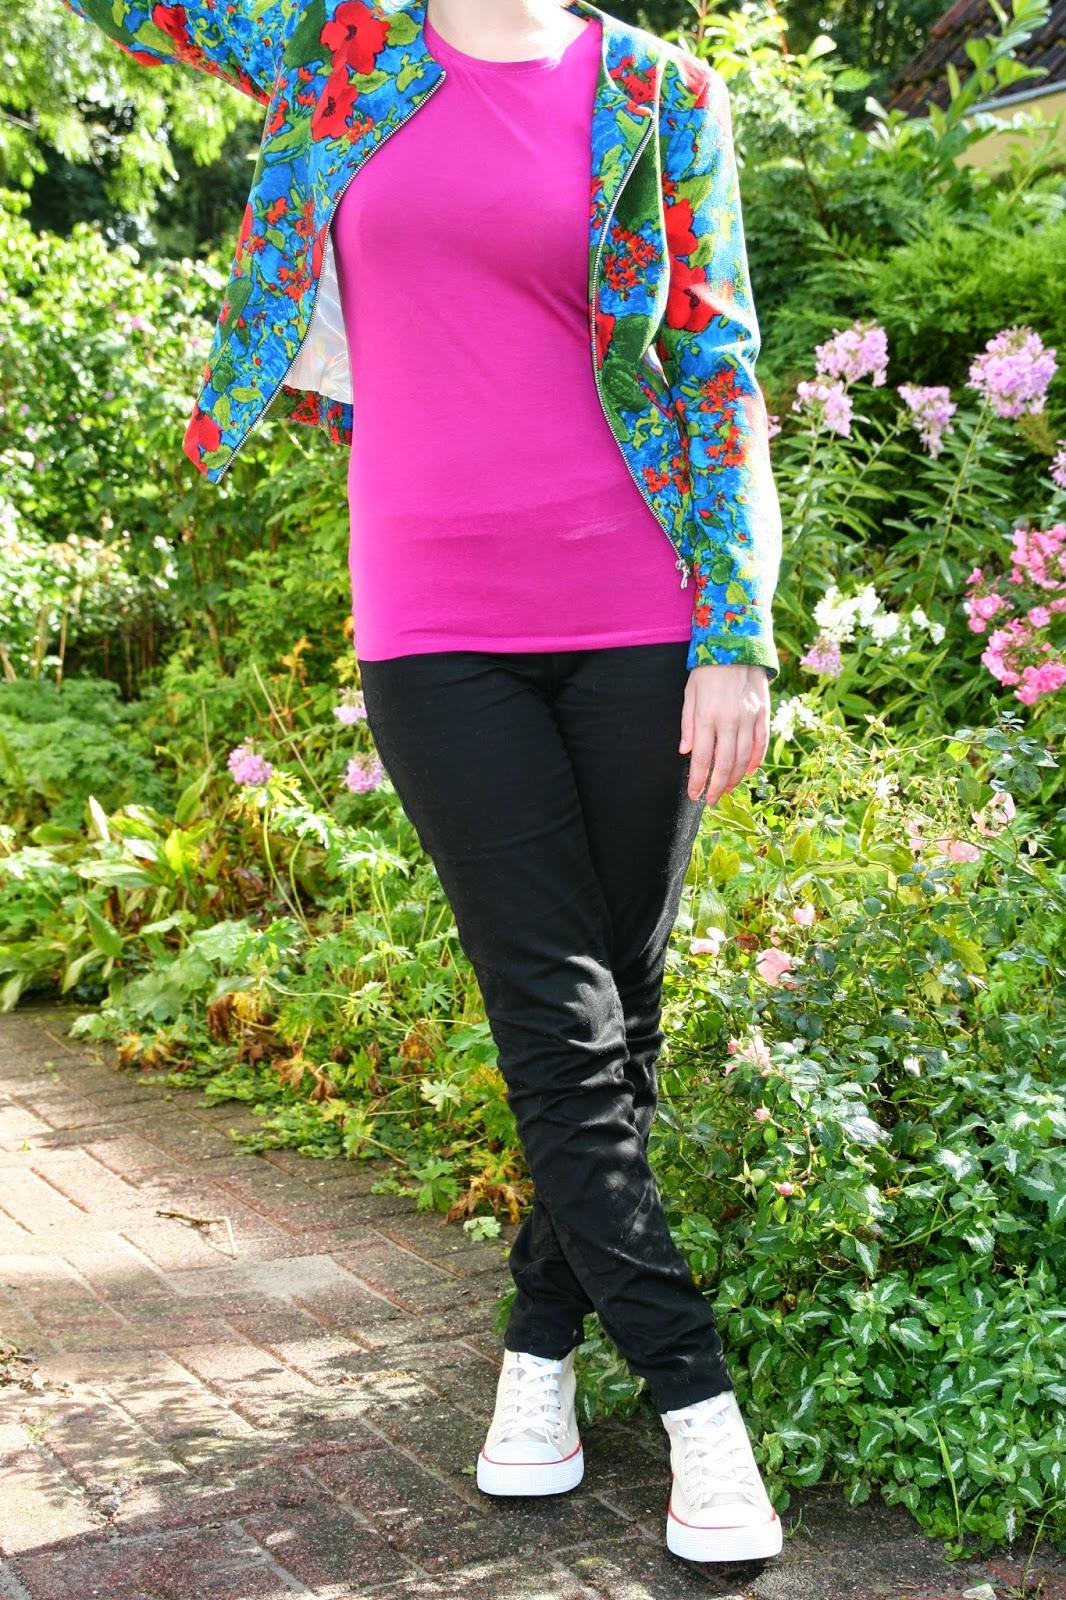 http://hmlovur.blogspot.nl/2014/08/outfits-of-week-week-34.html